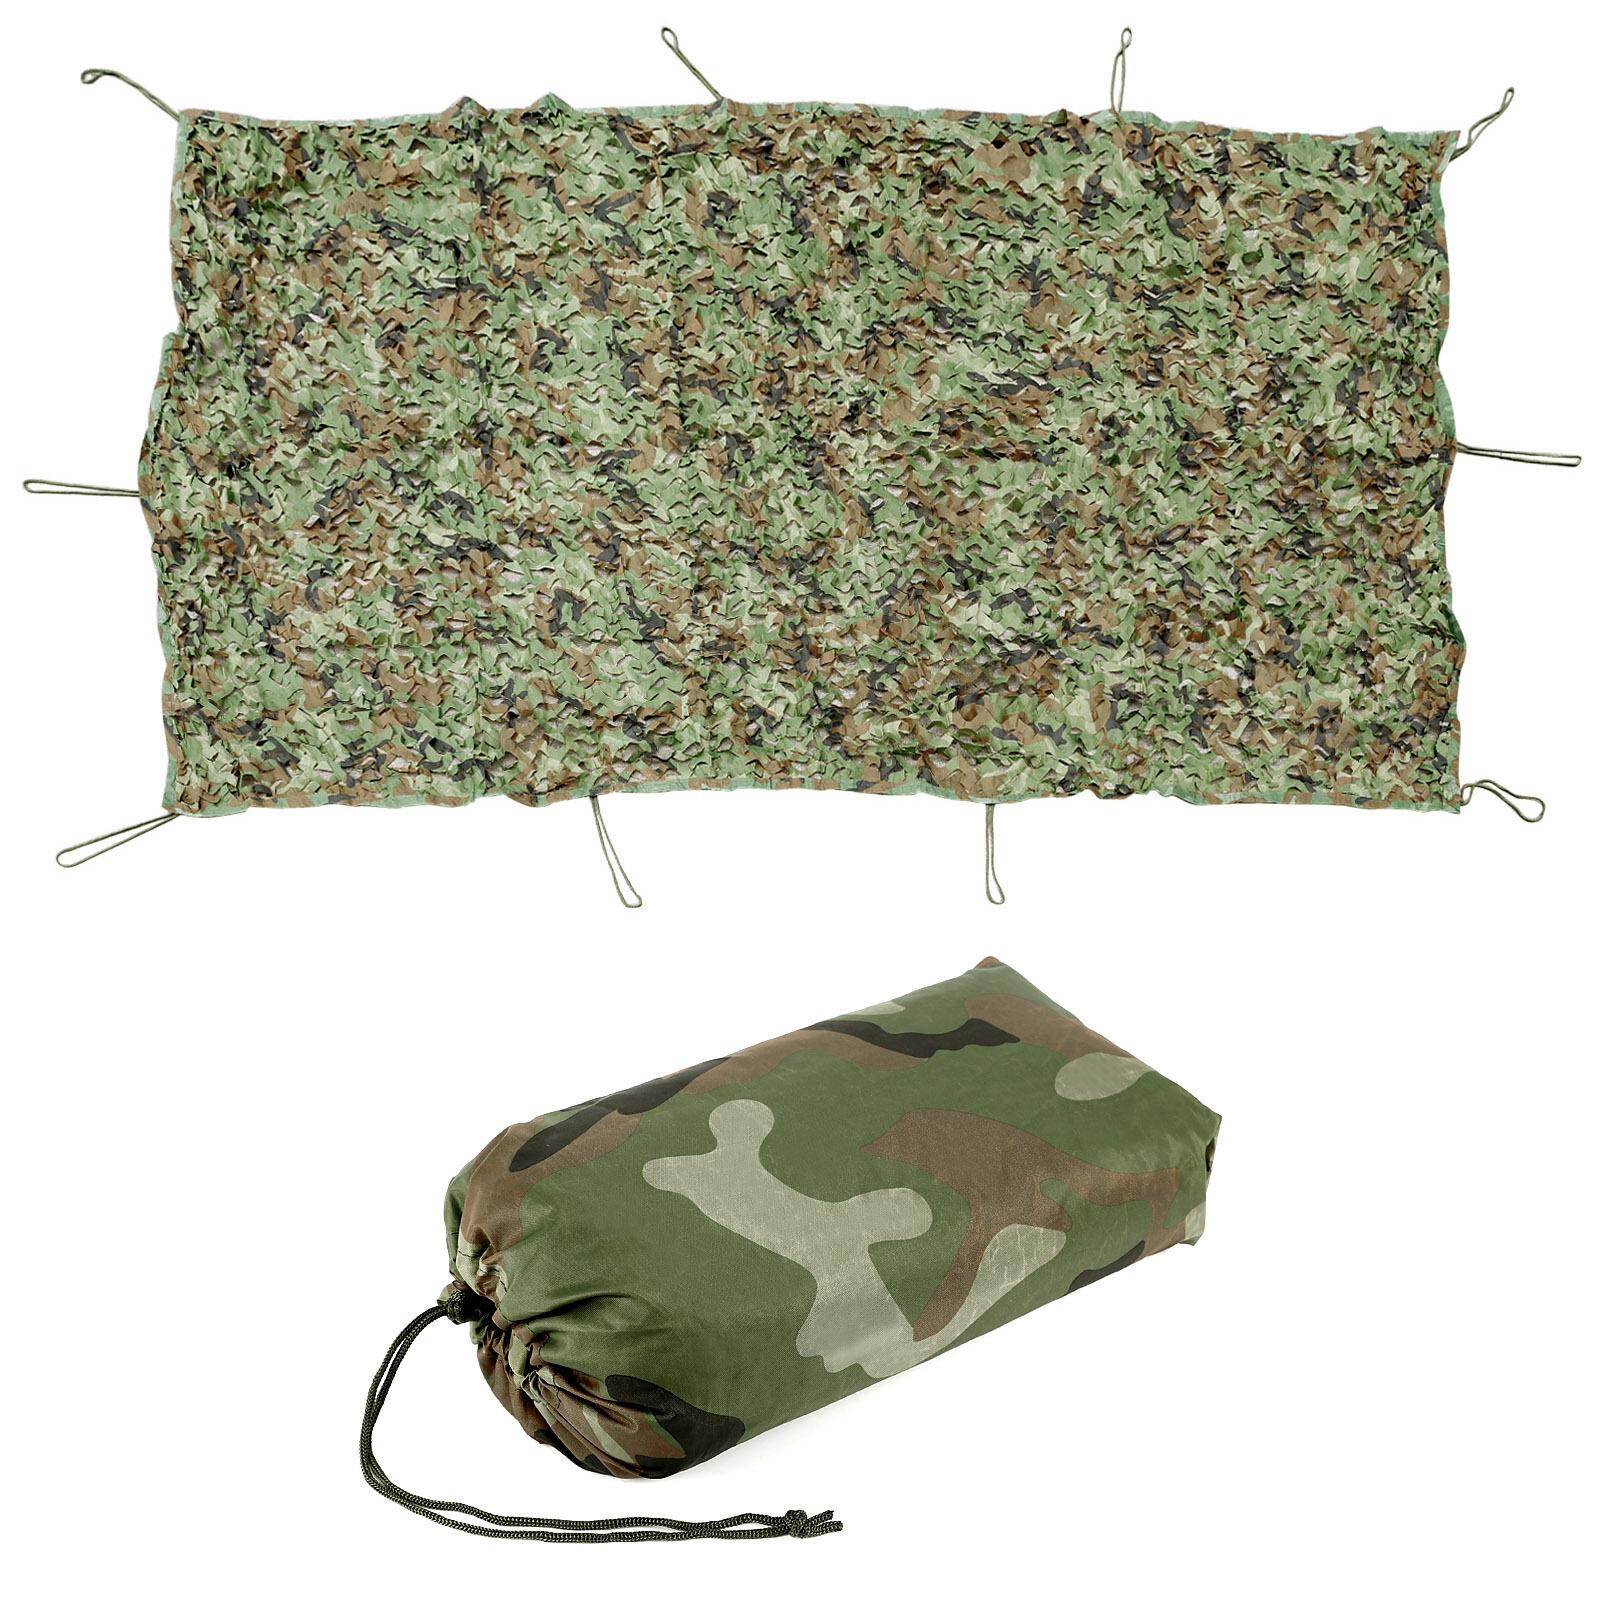 s l1600 - 1,5M 2M 3M 4M Malla de Camuflaje Acampada Camping Caza War Game Camuflaje